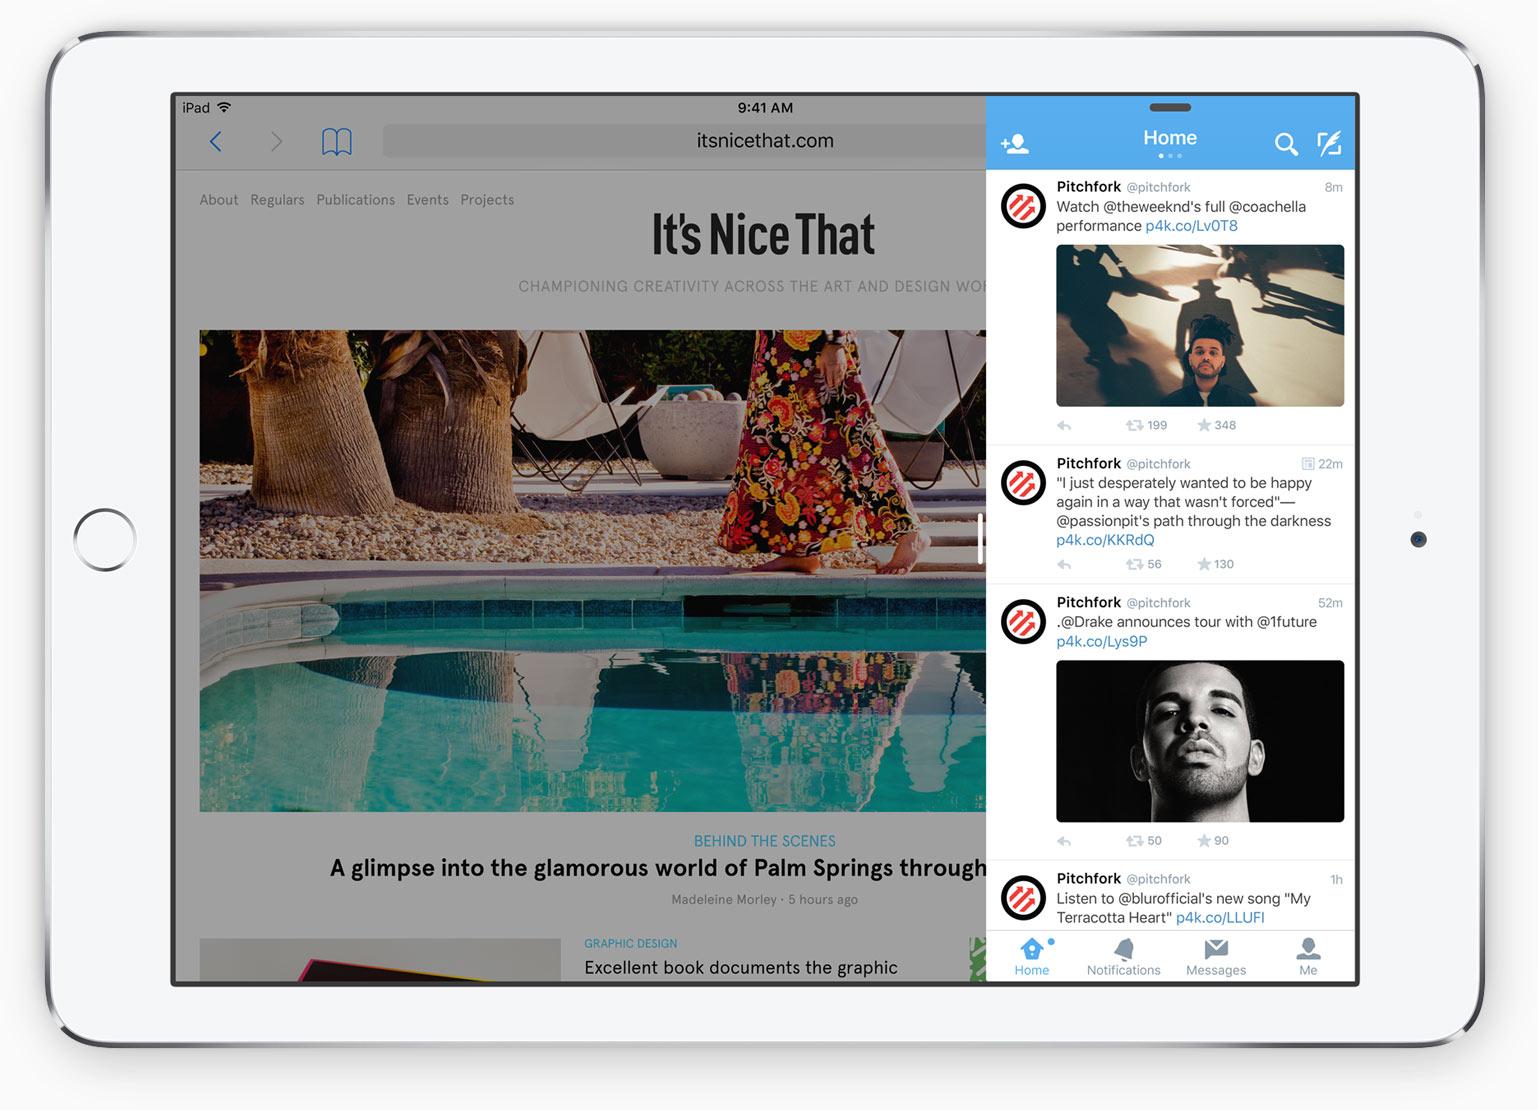 iPad Mini 4 Slide Over